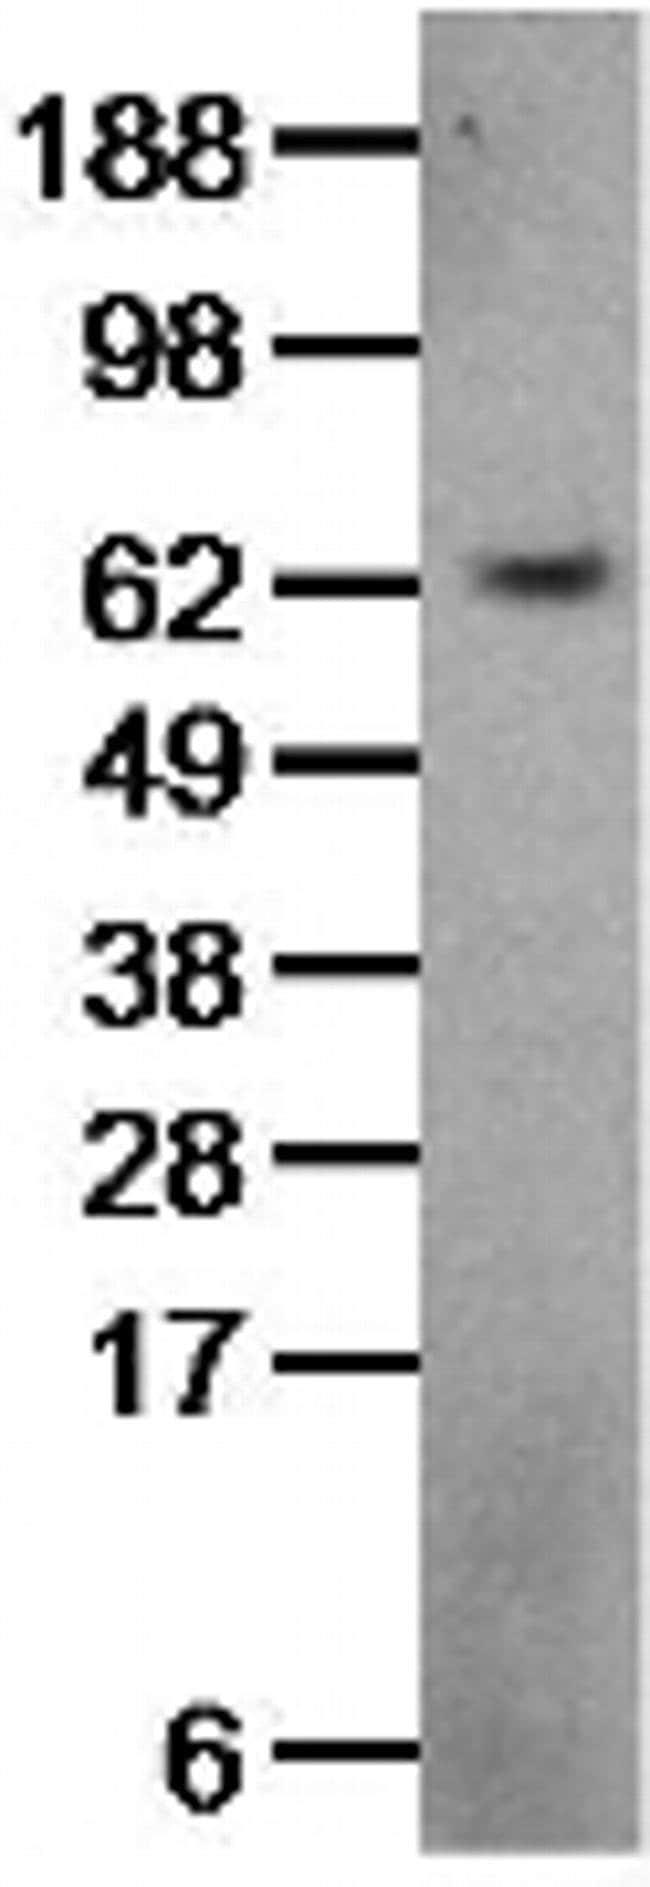 ACT1 Rat anti-Human, Clone: 9ACT12, eBioscience™ 100 μg; Unconjugated ACT1 Rat anti-Human, Clone: 9ACT12, eBioscience™